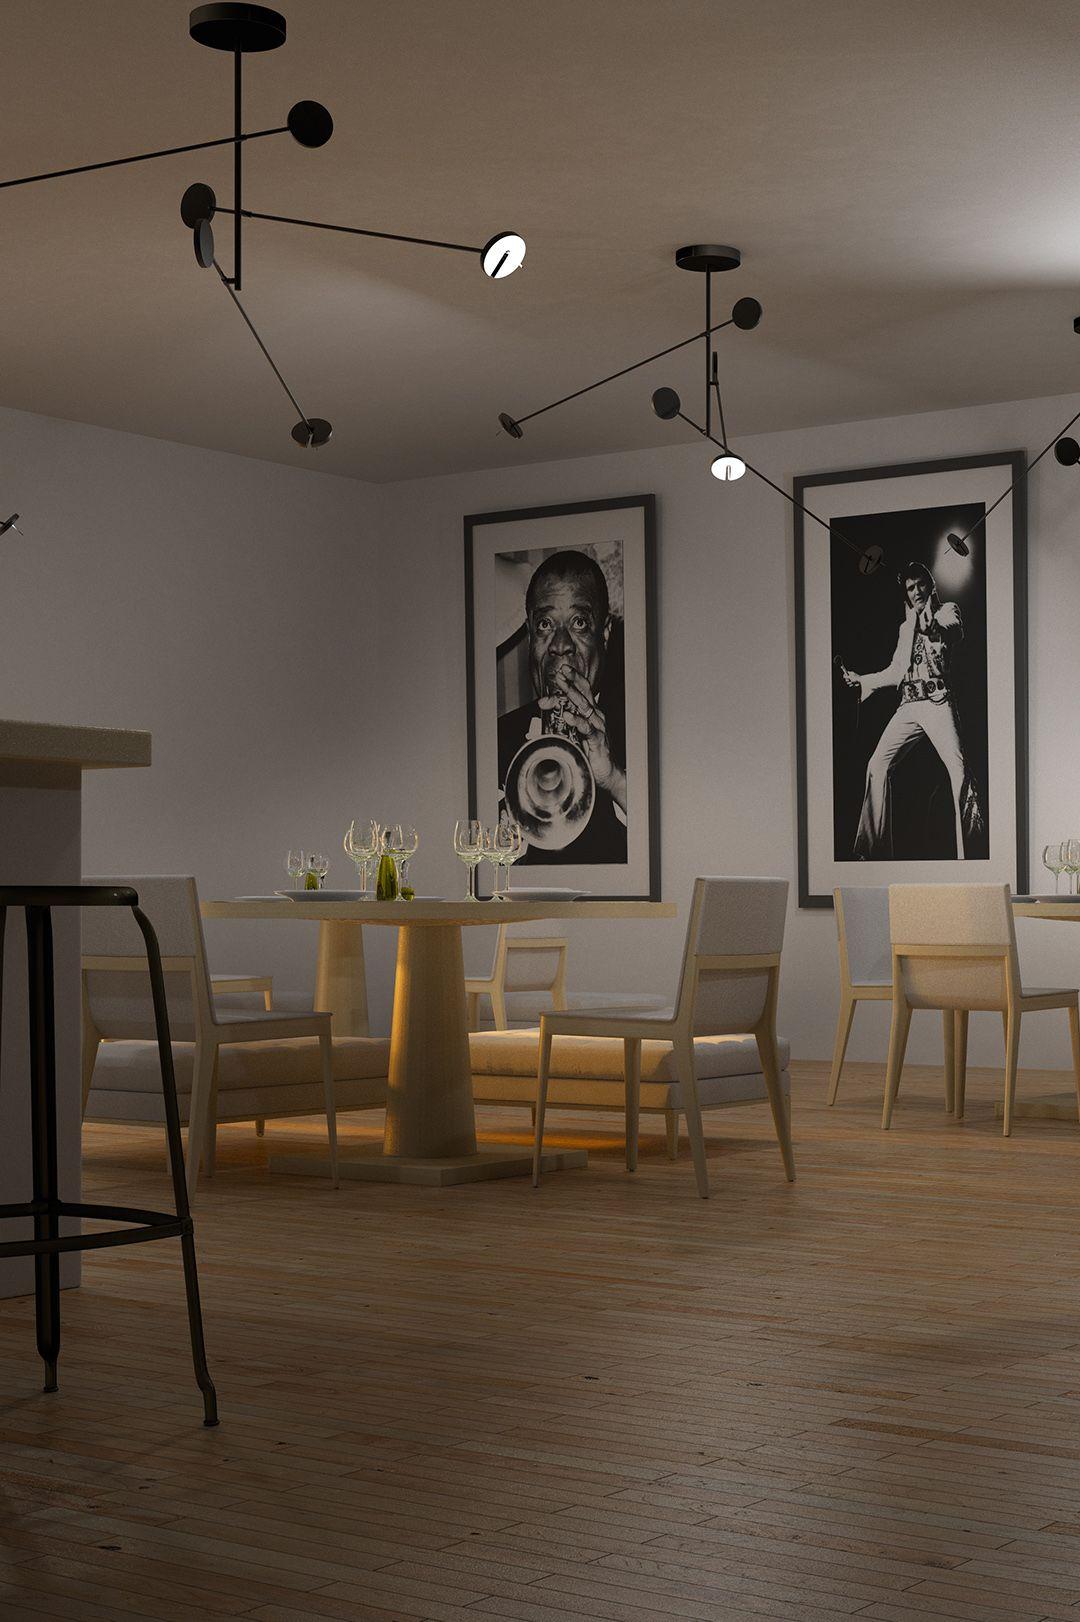 luminaire design led lampe invisible noir en 2019. Black Bedroom Furniture Sets. Home Design Ideas